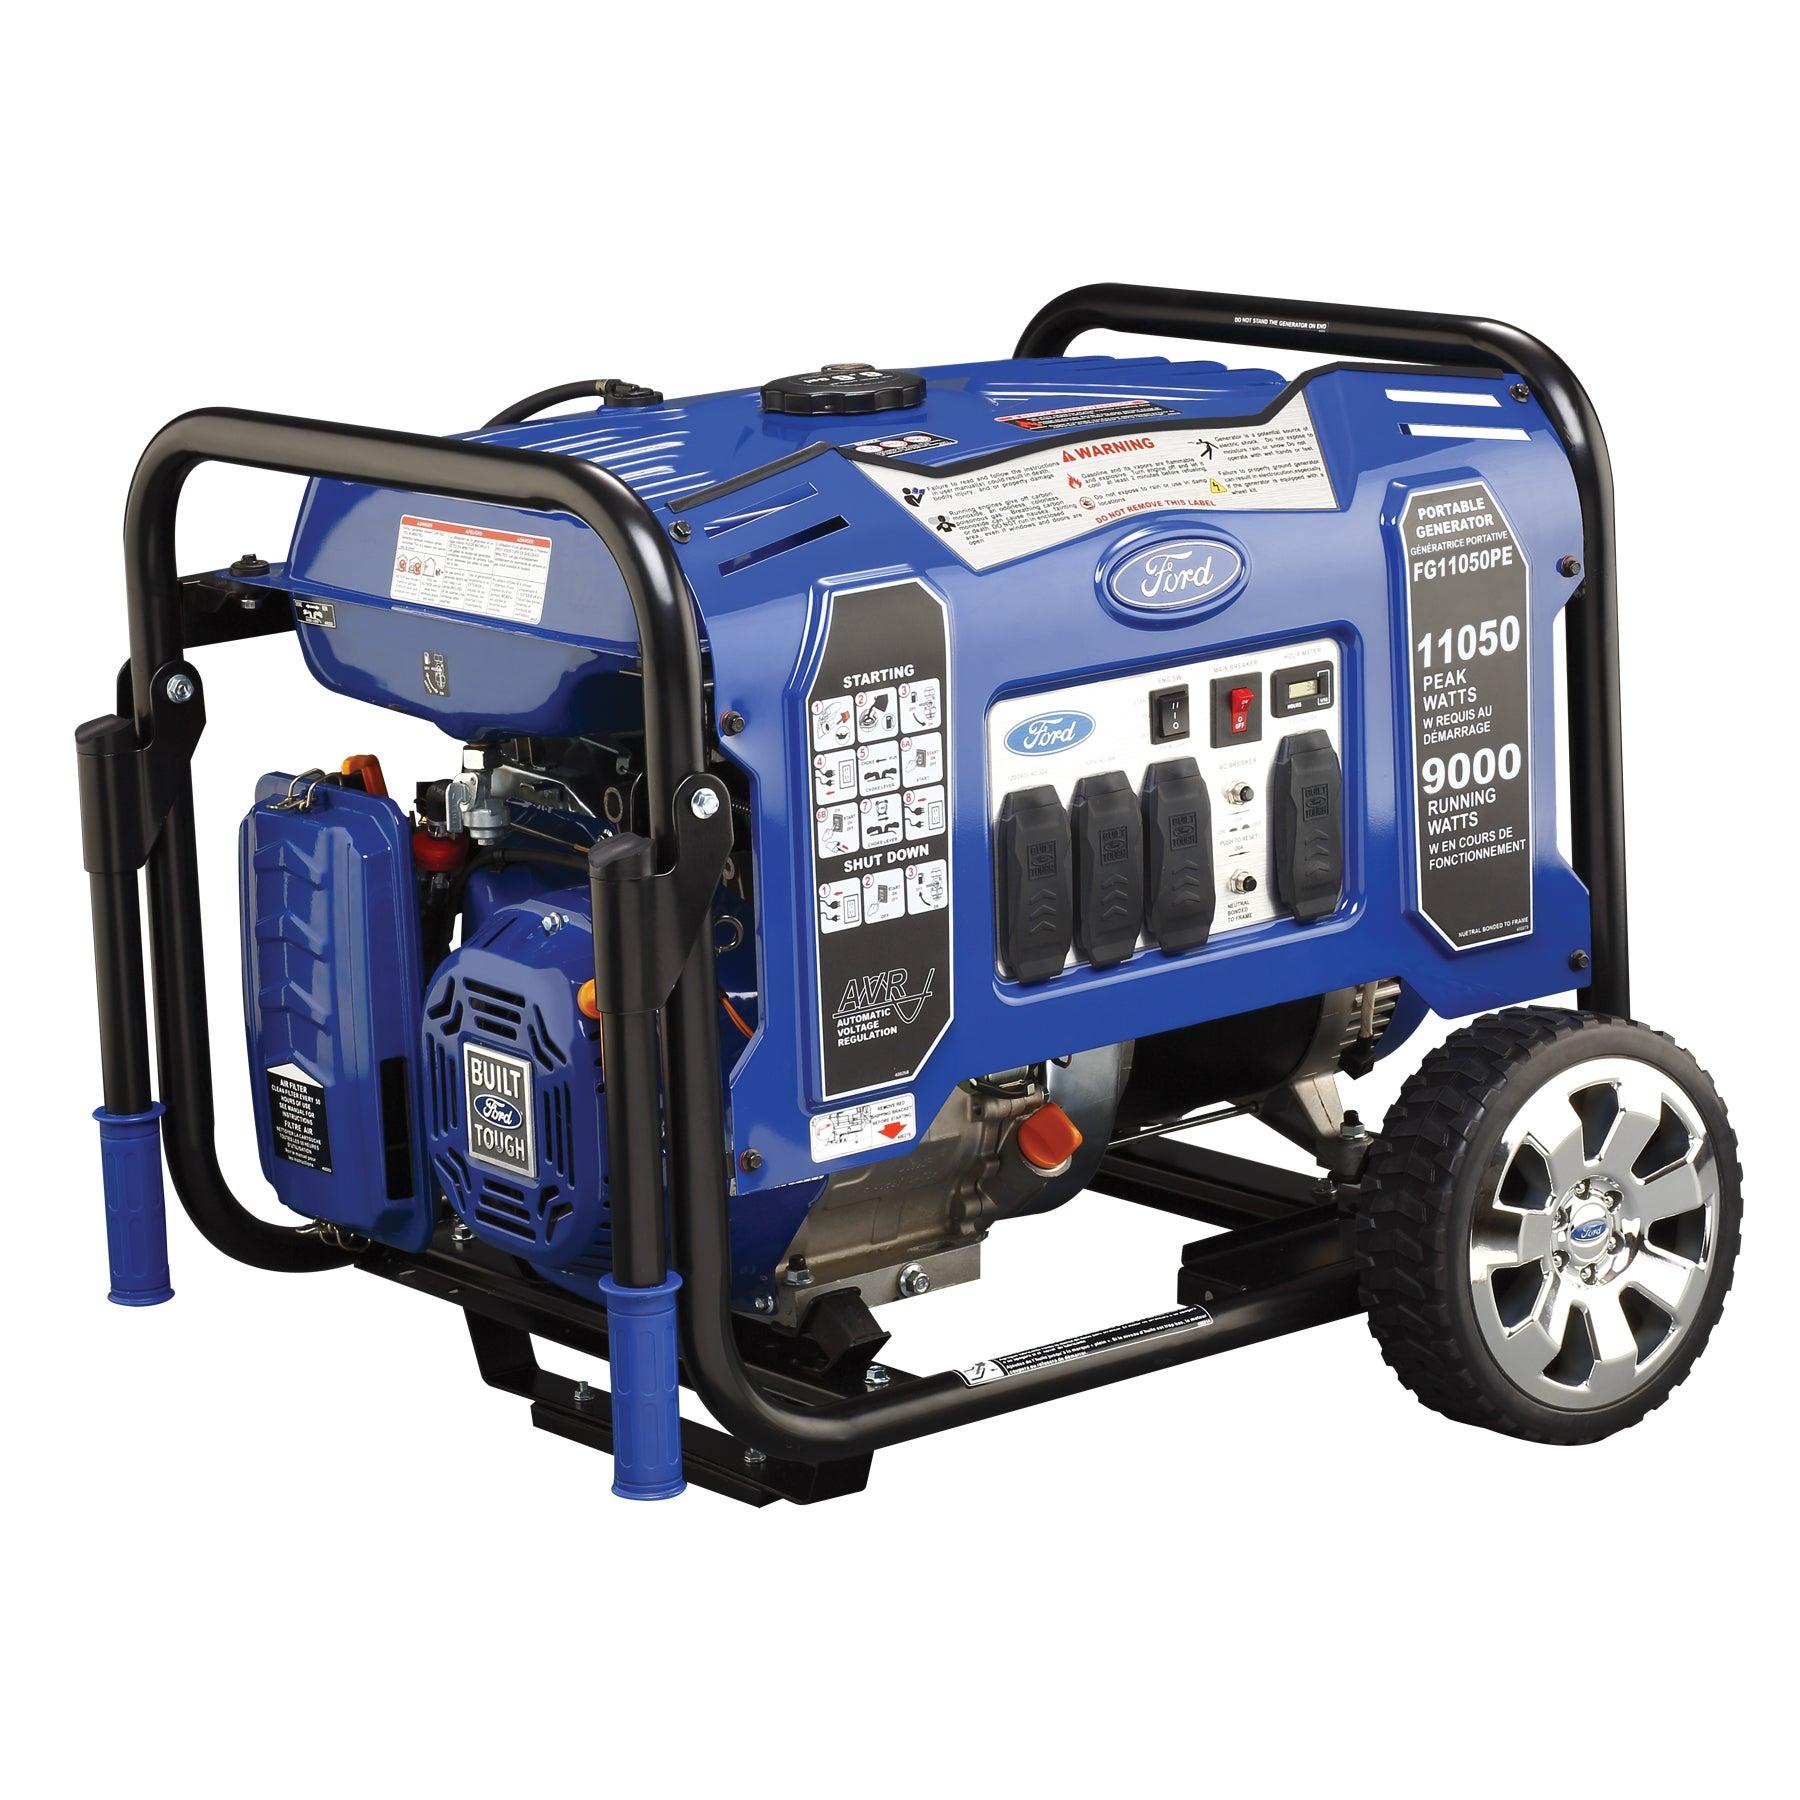 Ford watt Portable Generator Free Shipping Today